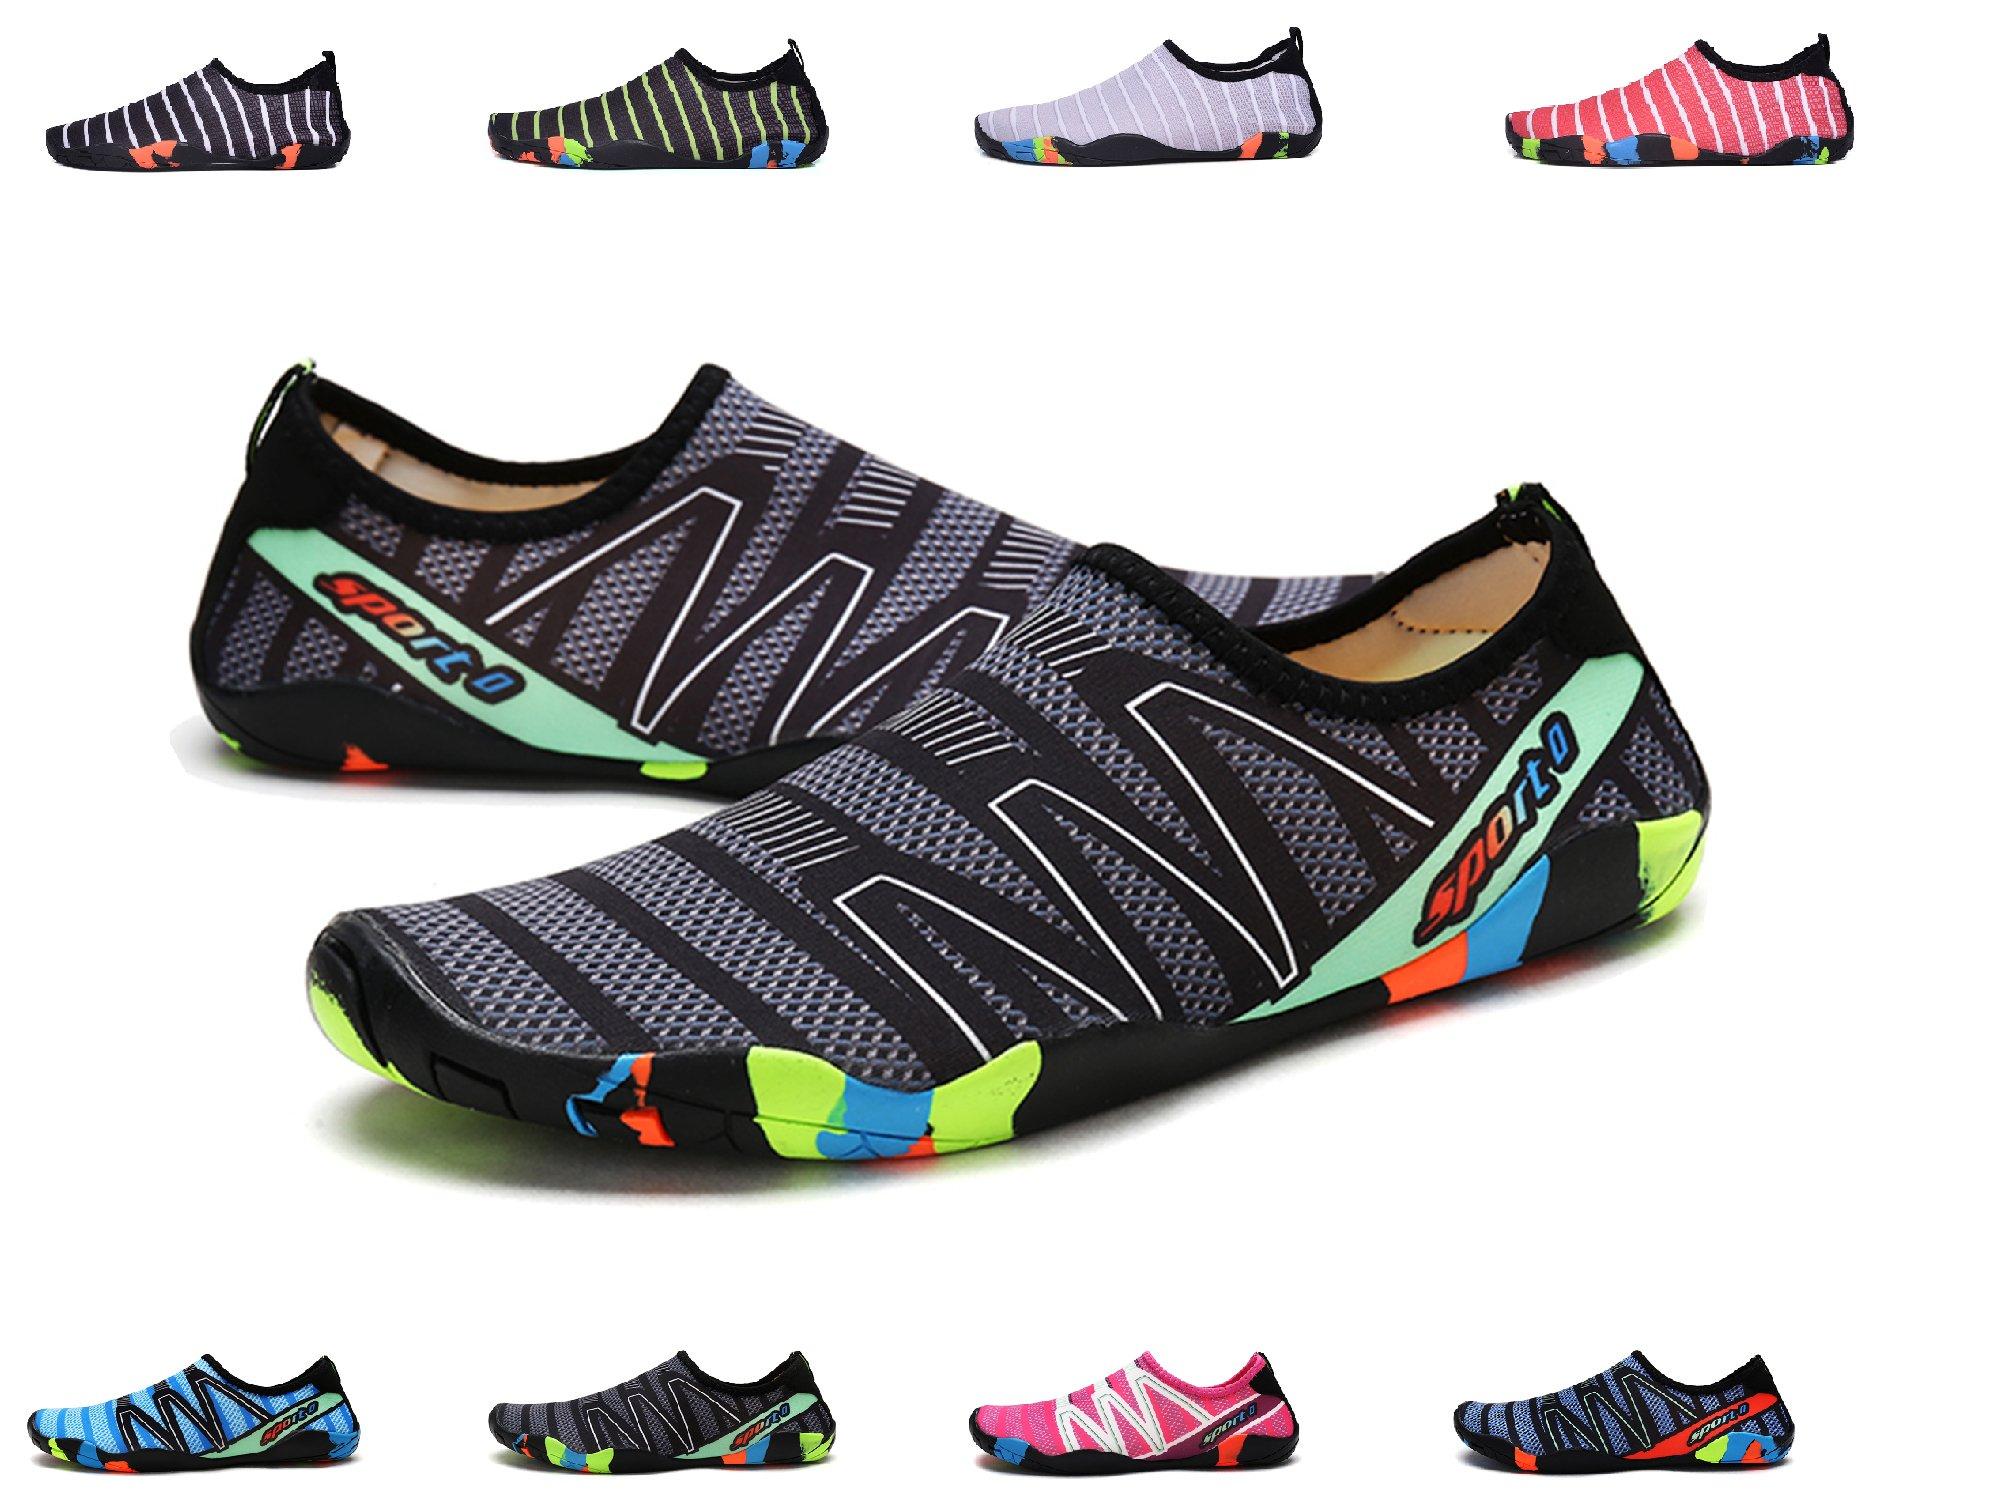 XPKWS Water Shoes for Women Men Quick-Dry Swim Shoes Outdoor Mens Womens Surf Boating Sports (Black01, 11.5 D(M) US Men)